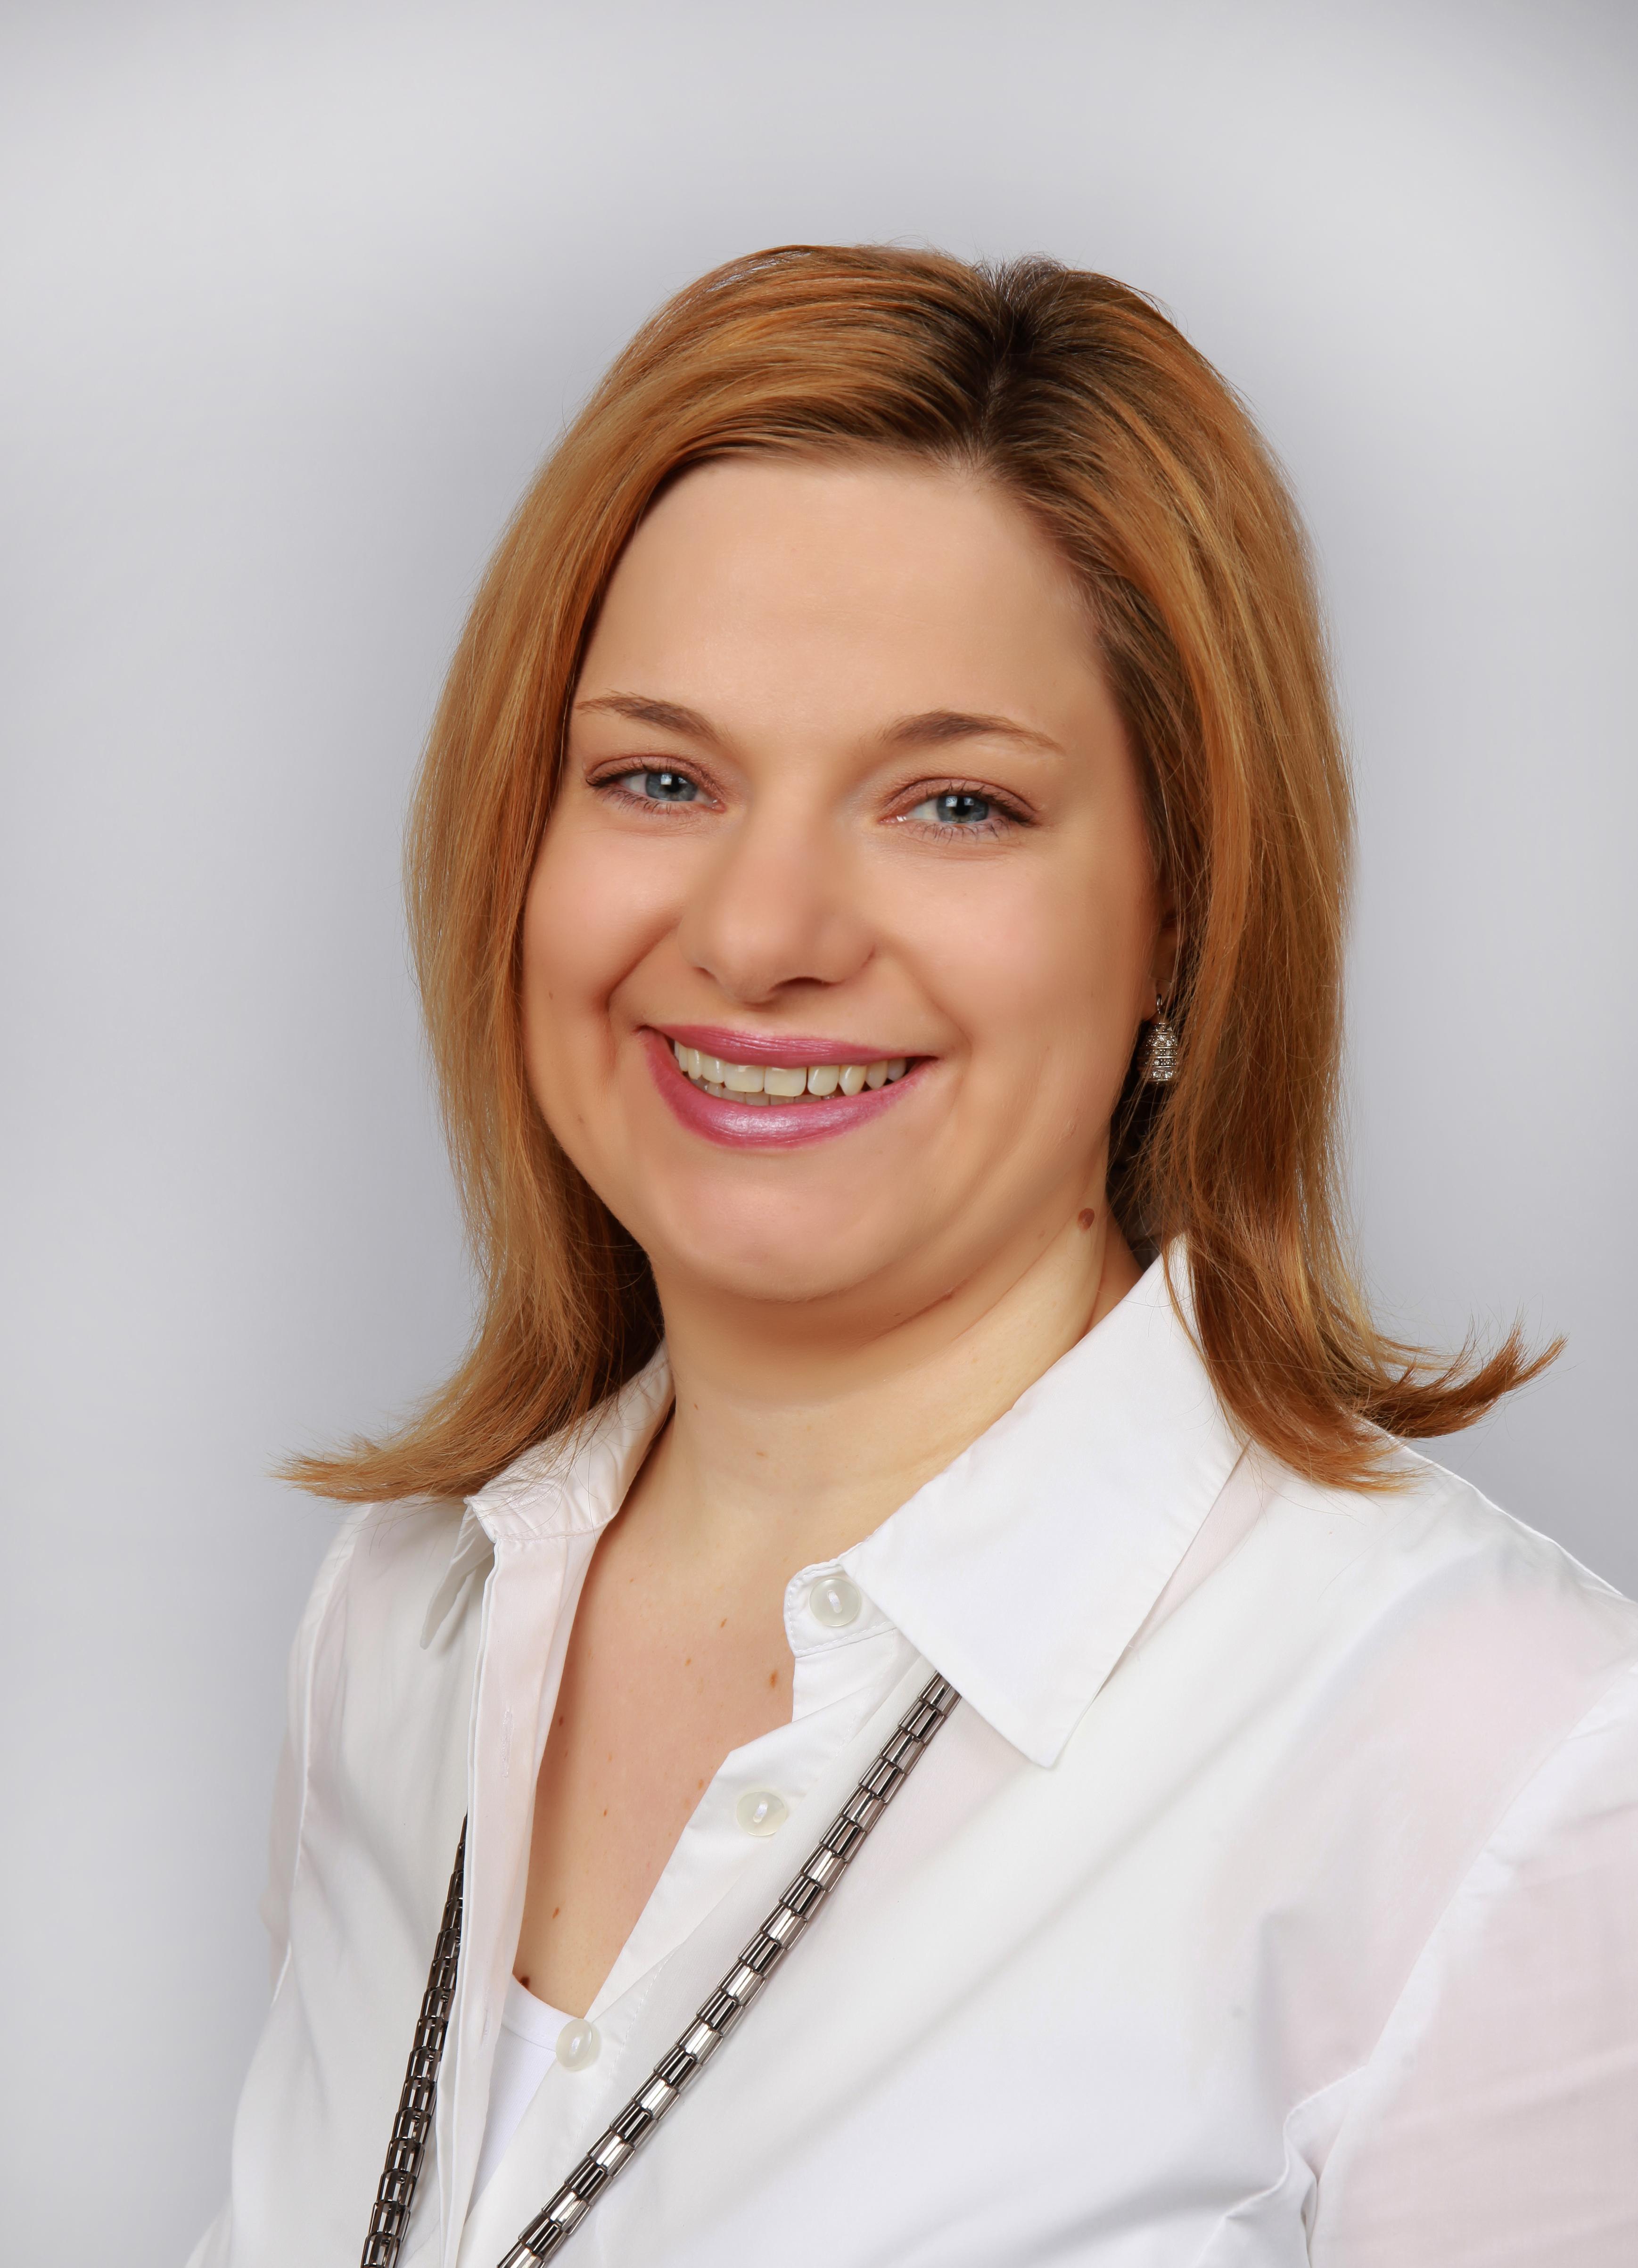 Stephanie Bammesberger